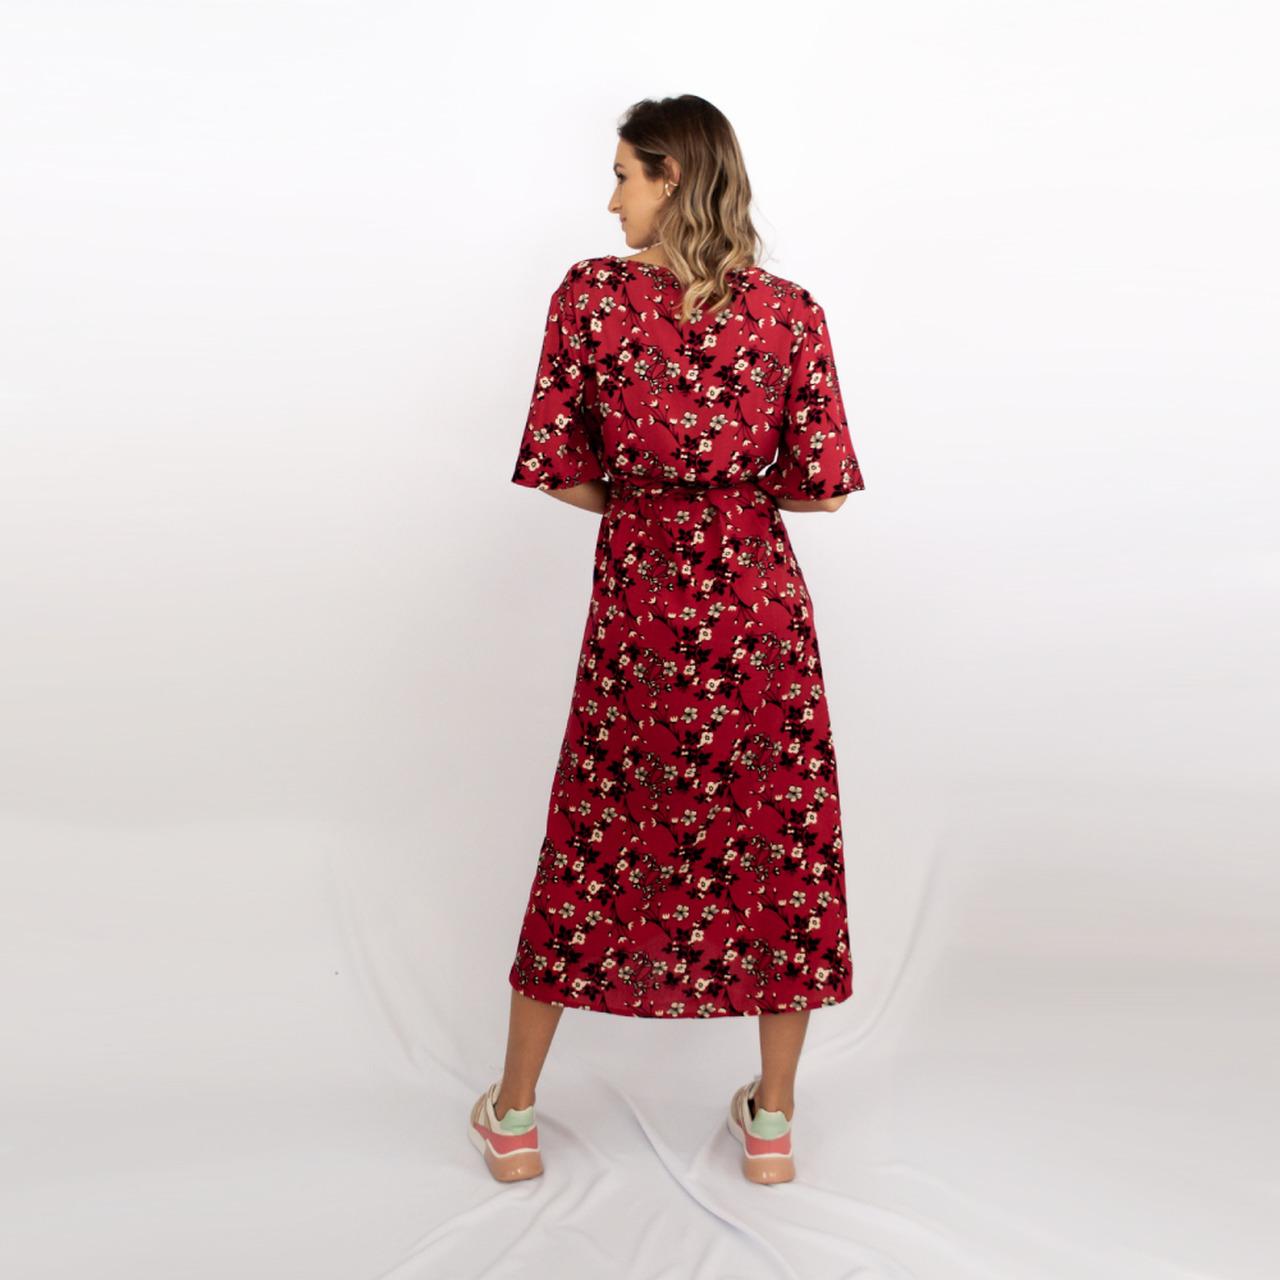 Vestido Transpassado Juli - Vermelho